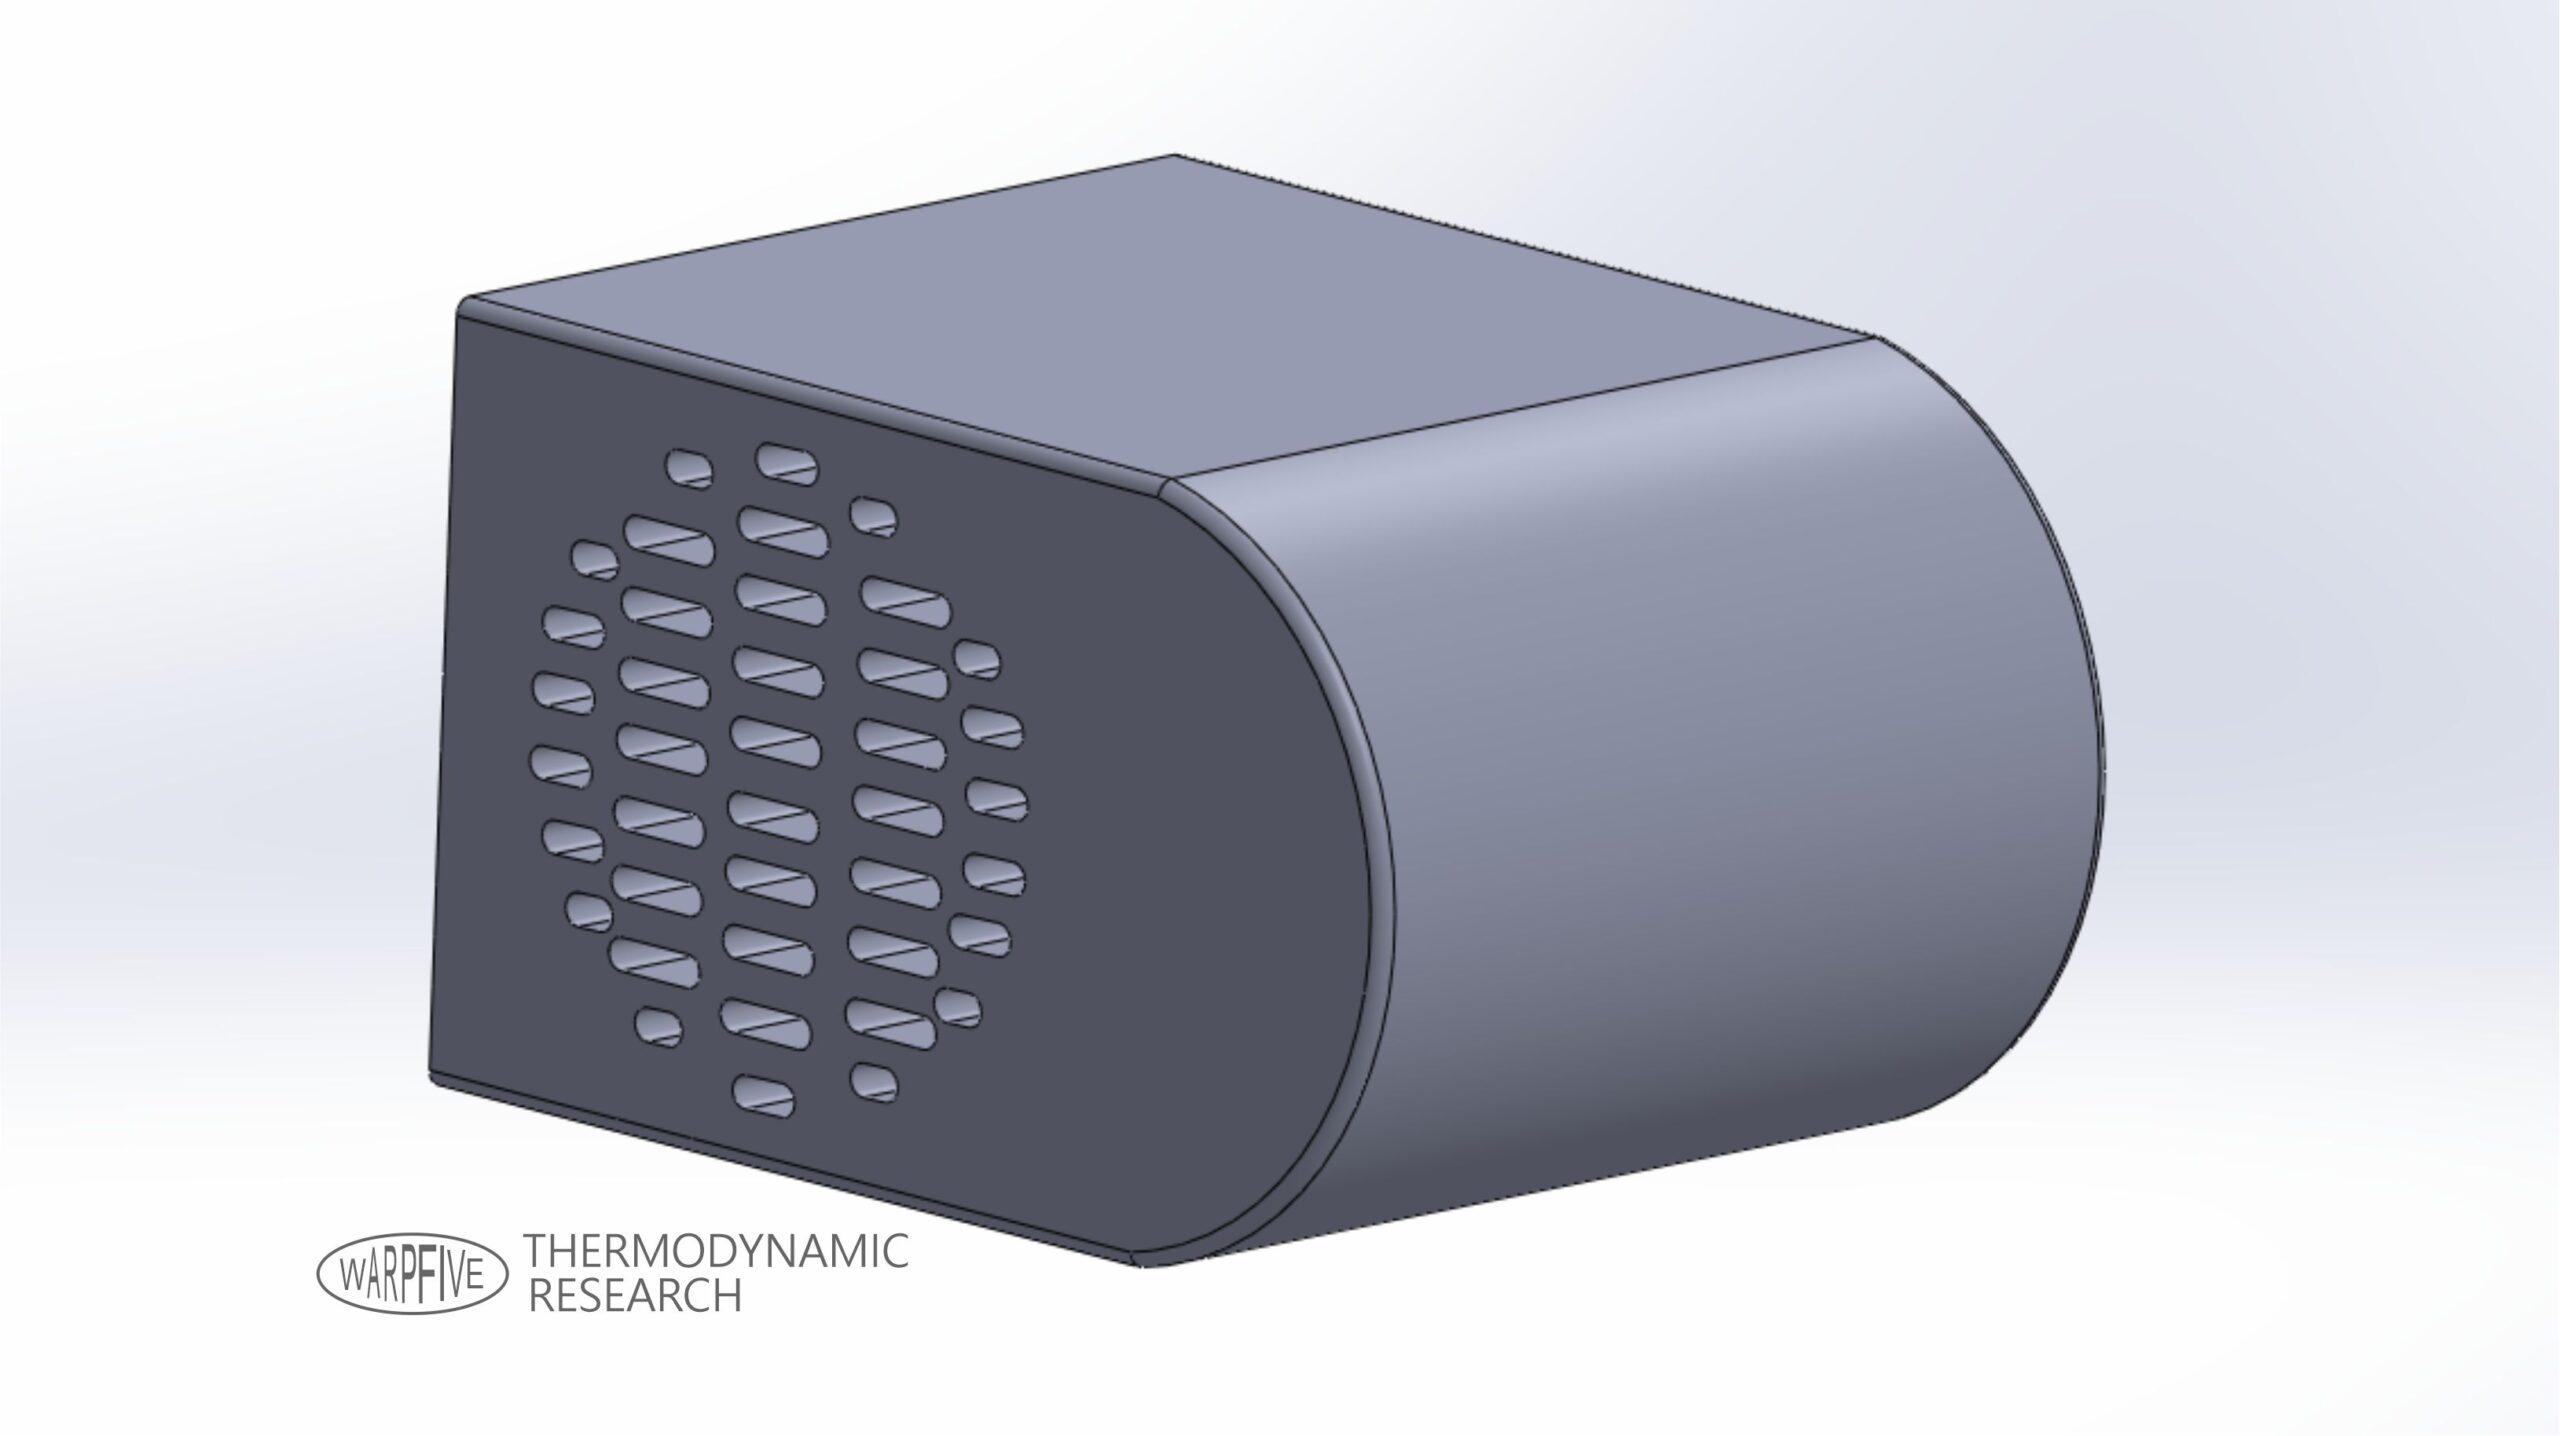 Warpfive heat exchanger development for use with alternative energy sources